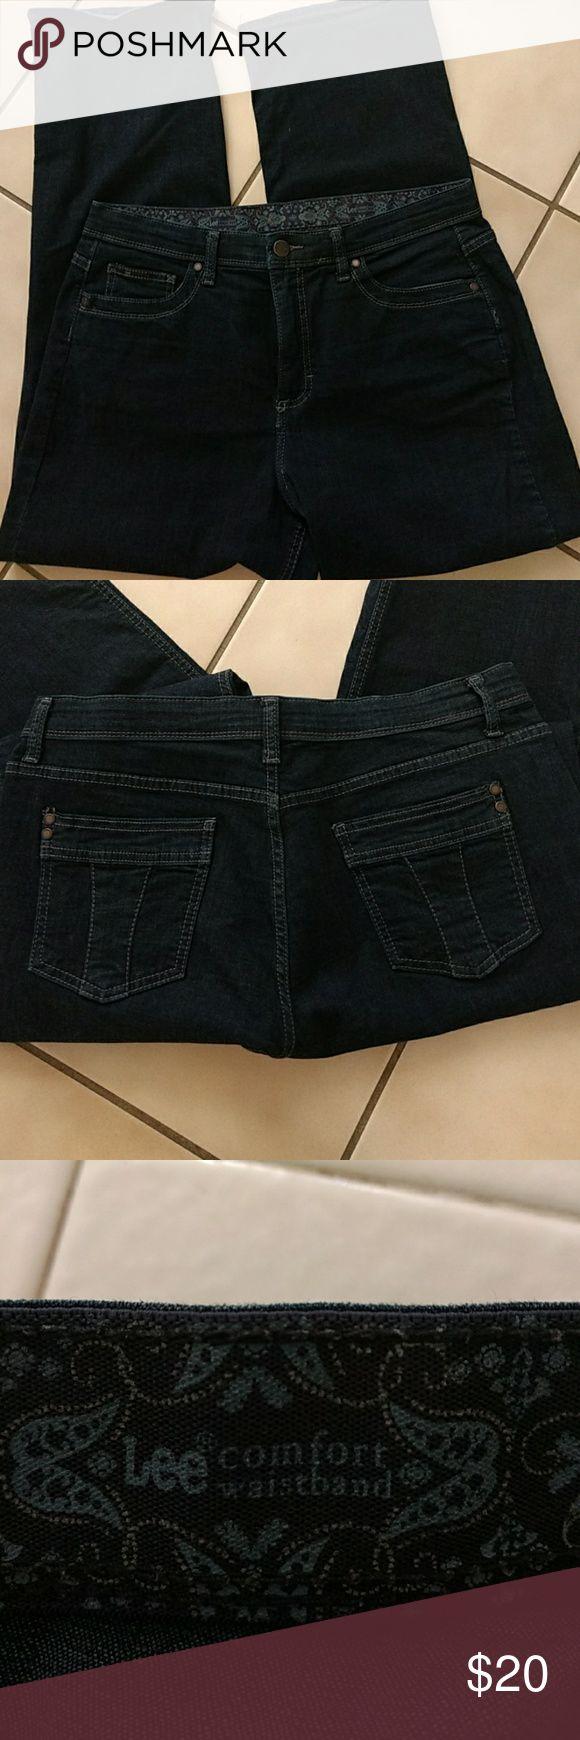 "Women's petite jeans Dark blue comfort waistband Lee jeans. Super comfortable. Inseam 27 1/2"" Across ankle 9"" lee Pants Straight Leg"